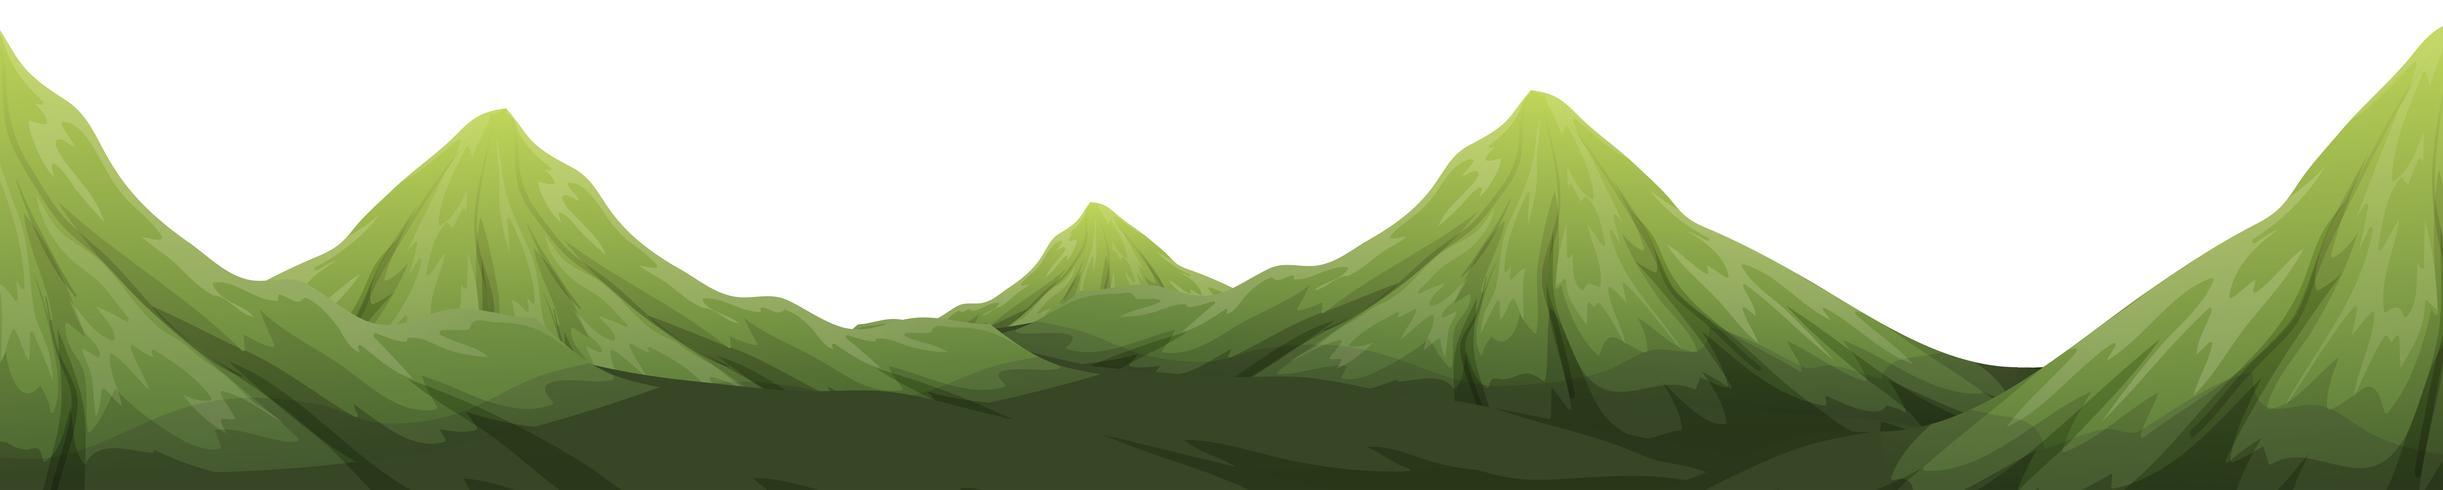 A green mountain landscape